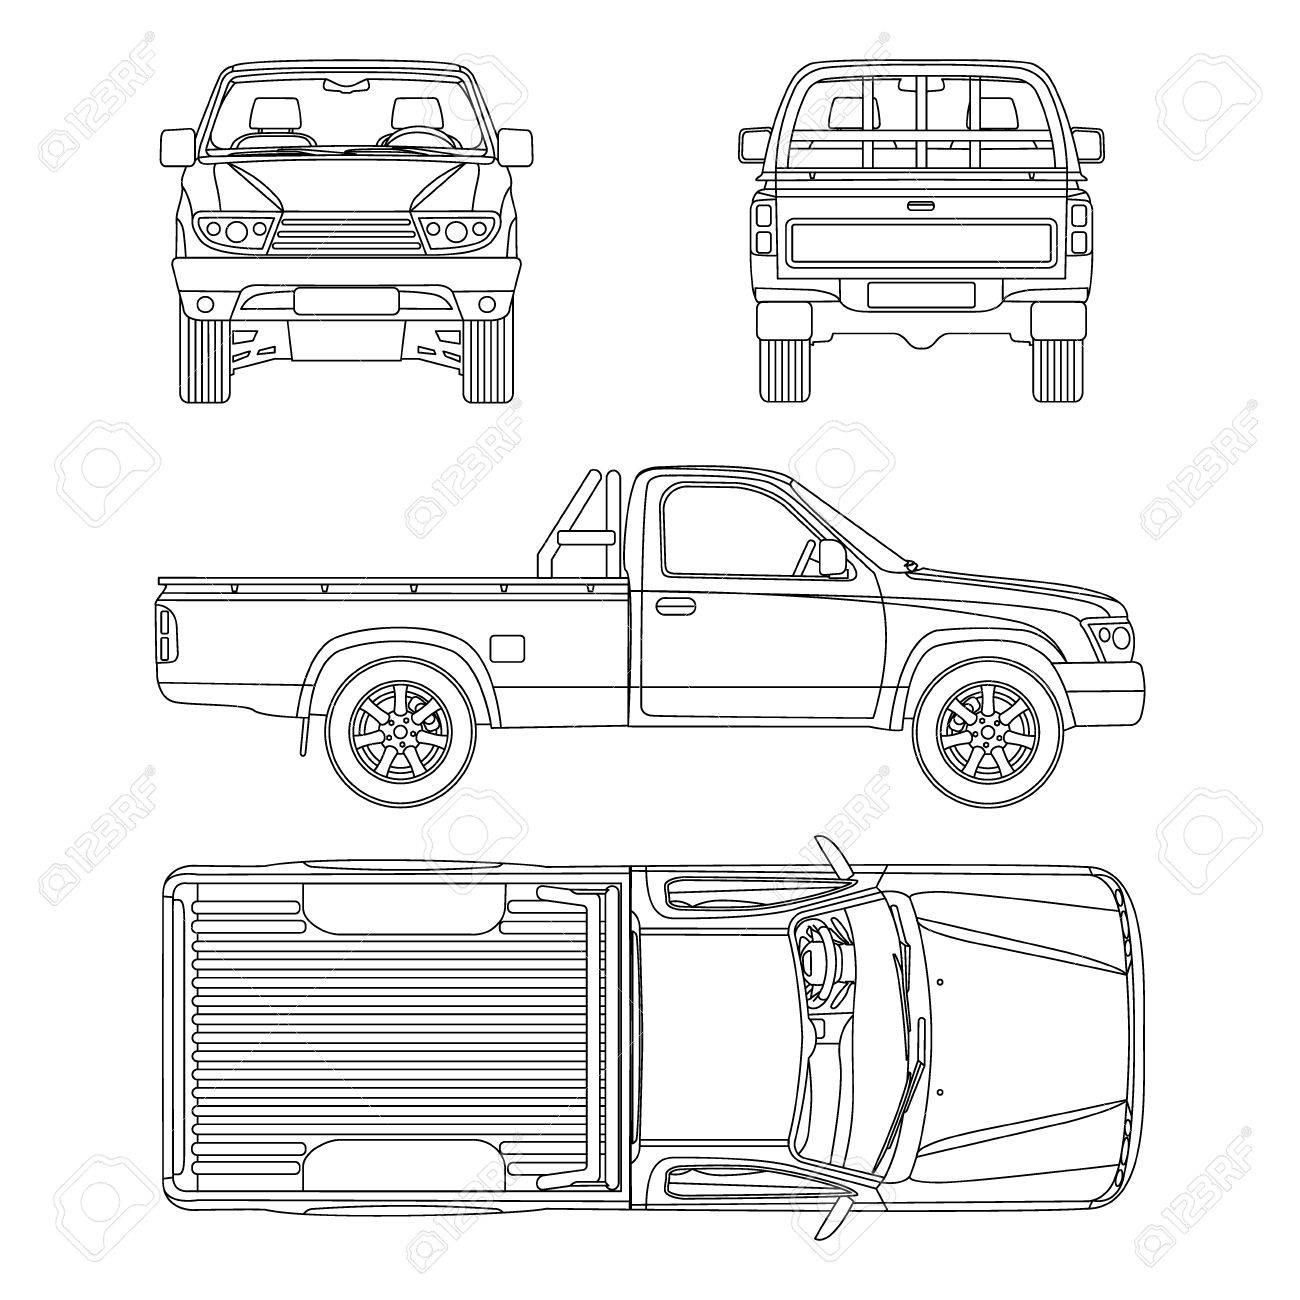 Pickup truck illustration blueprint royalty free cliparts vectors pickup truck illustration blueprint stock vector 55832520 malvernweather Images